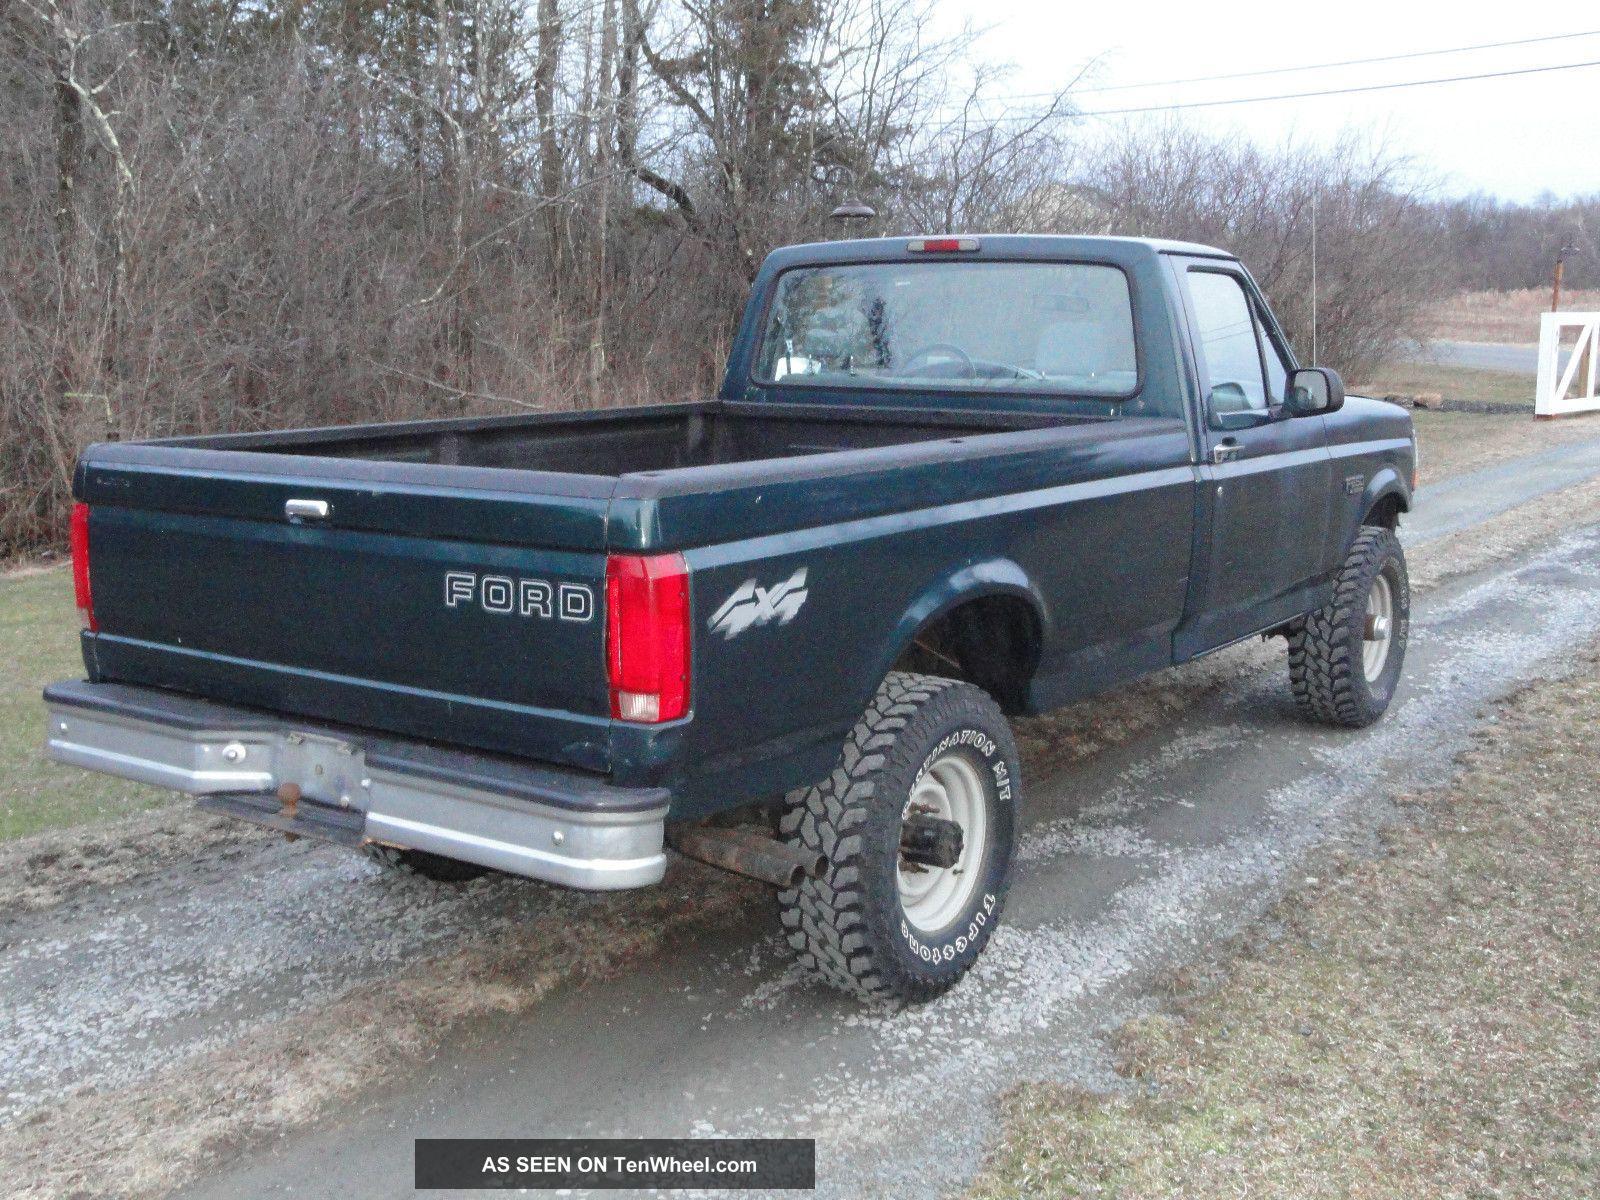 800 1024 1280 1600 origin 1994 Ford F-250 ...